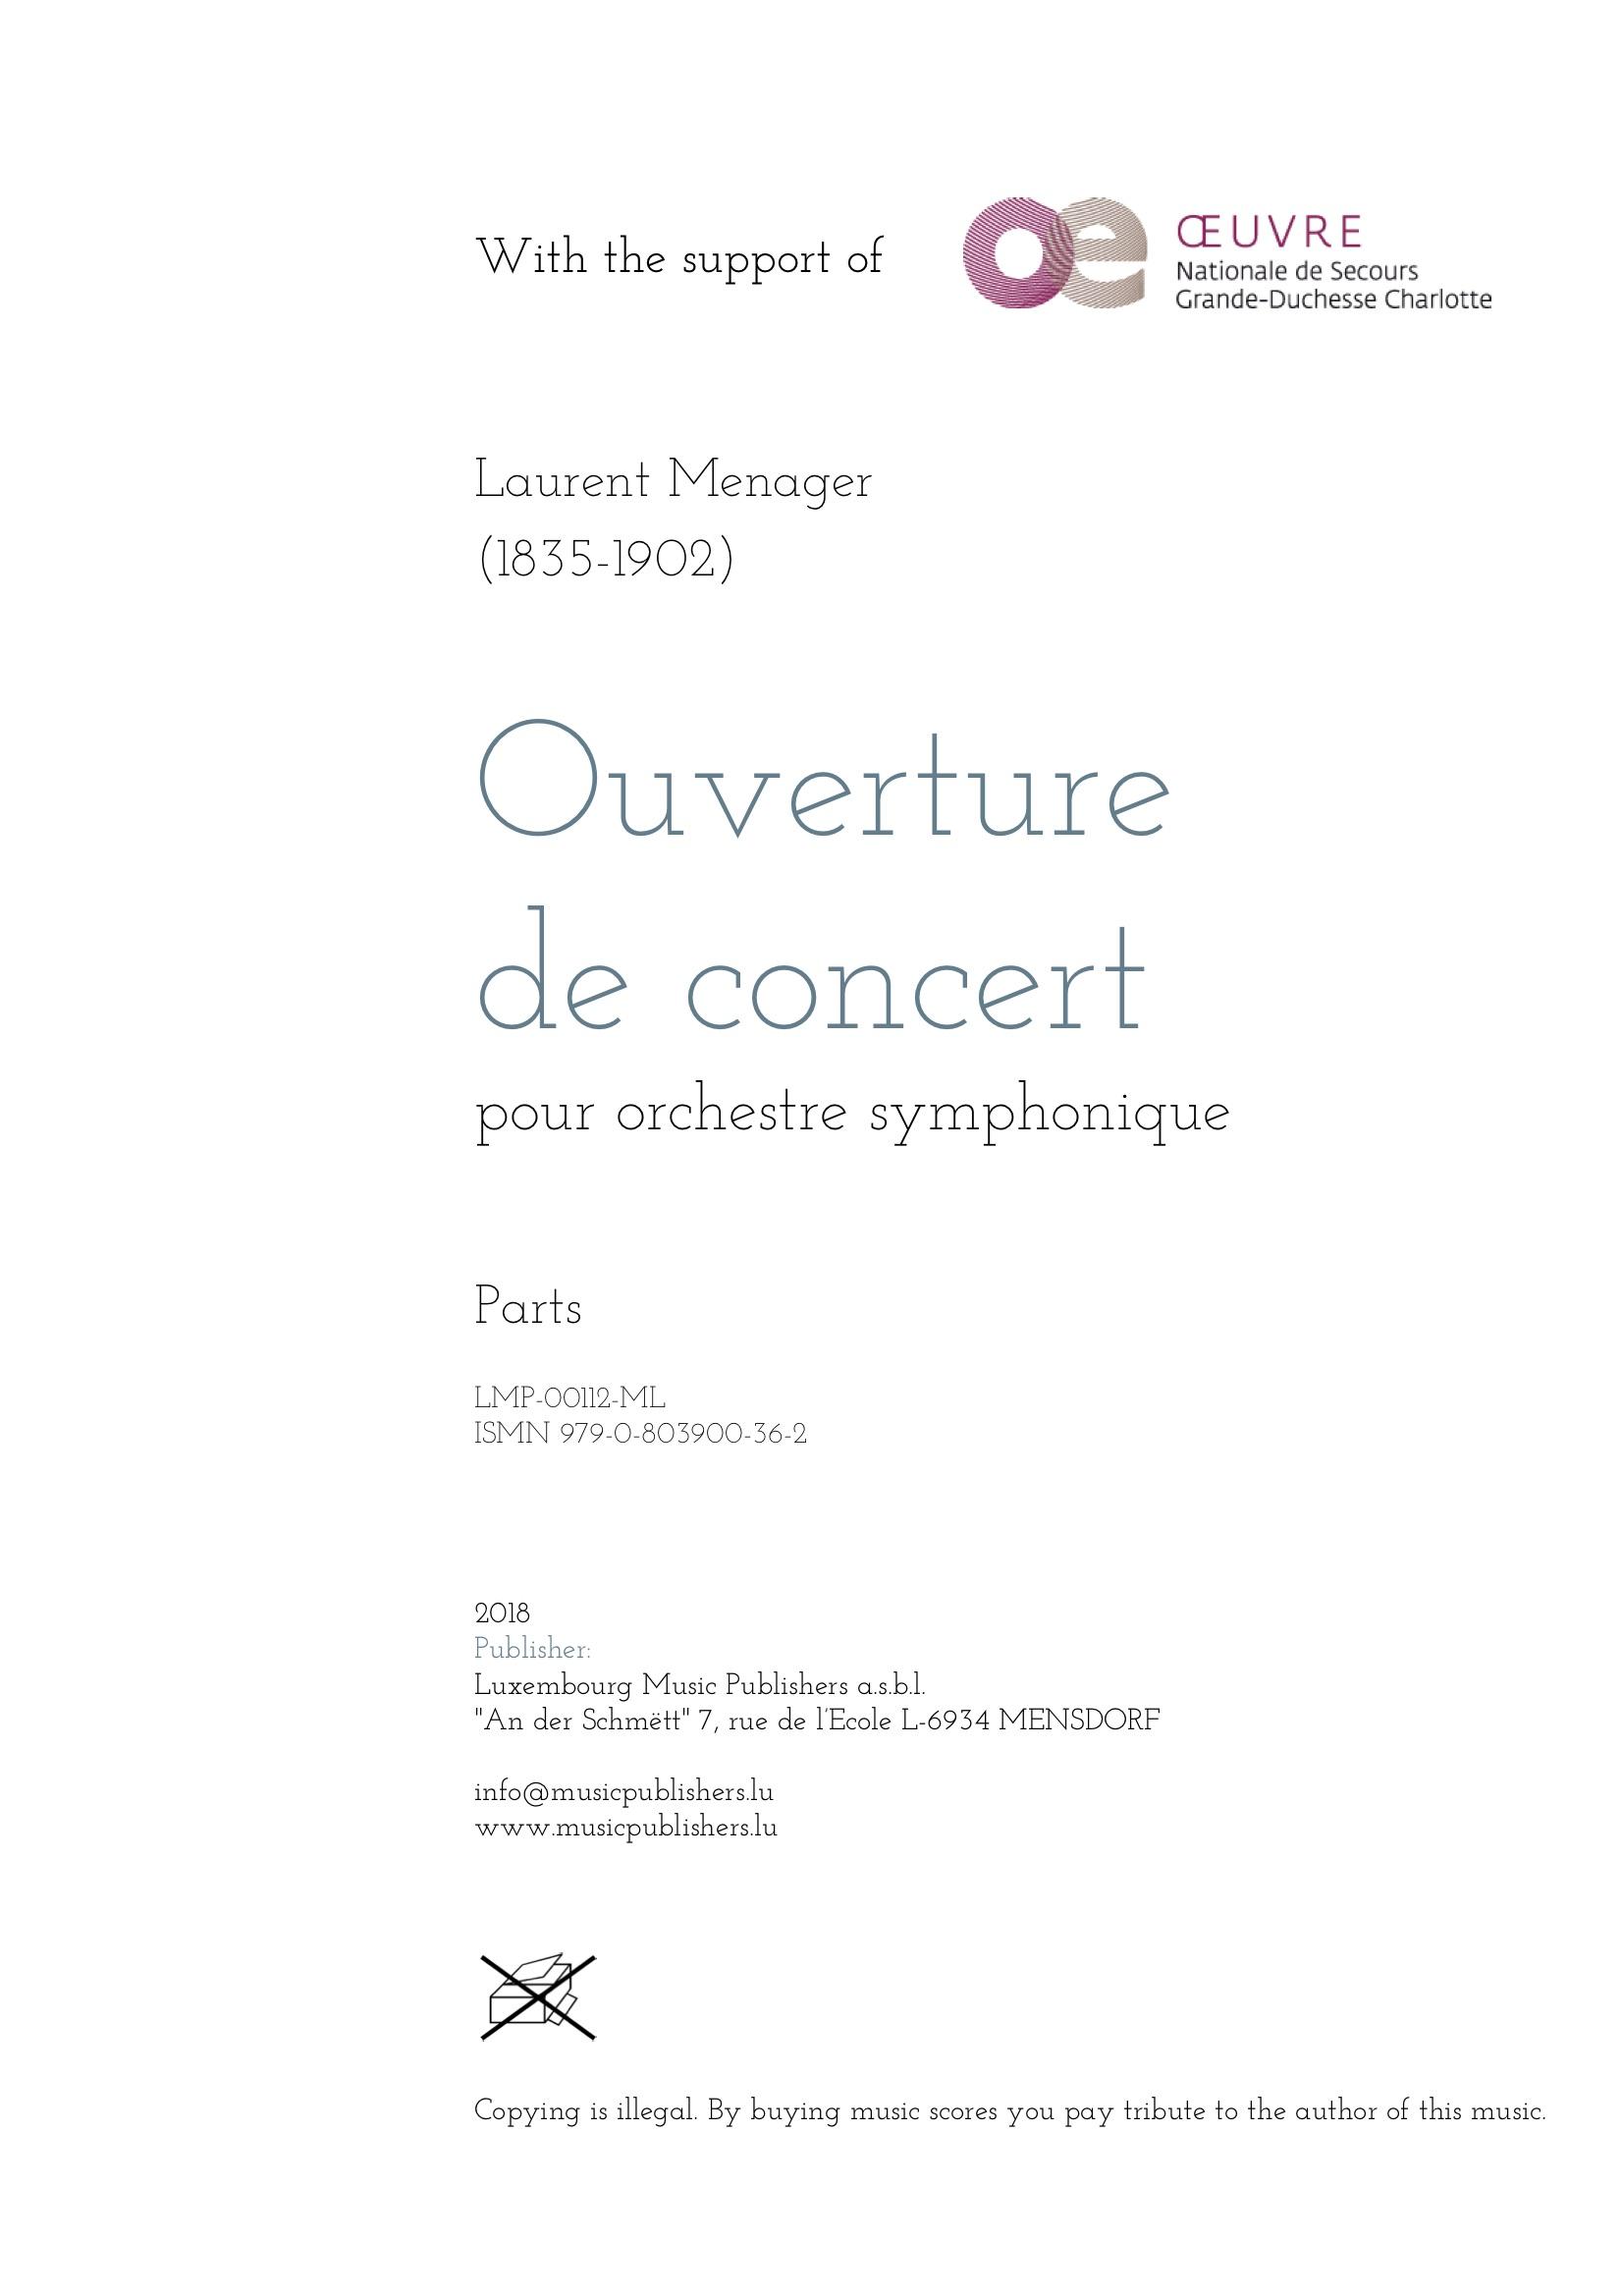 Ouverture de concert. Sheet Music by Laurent Menager, composer. Music for symphonic orchestra. Festive orchestral music. Parts.